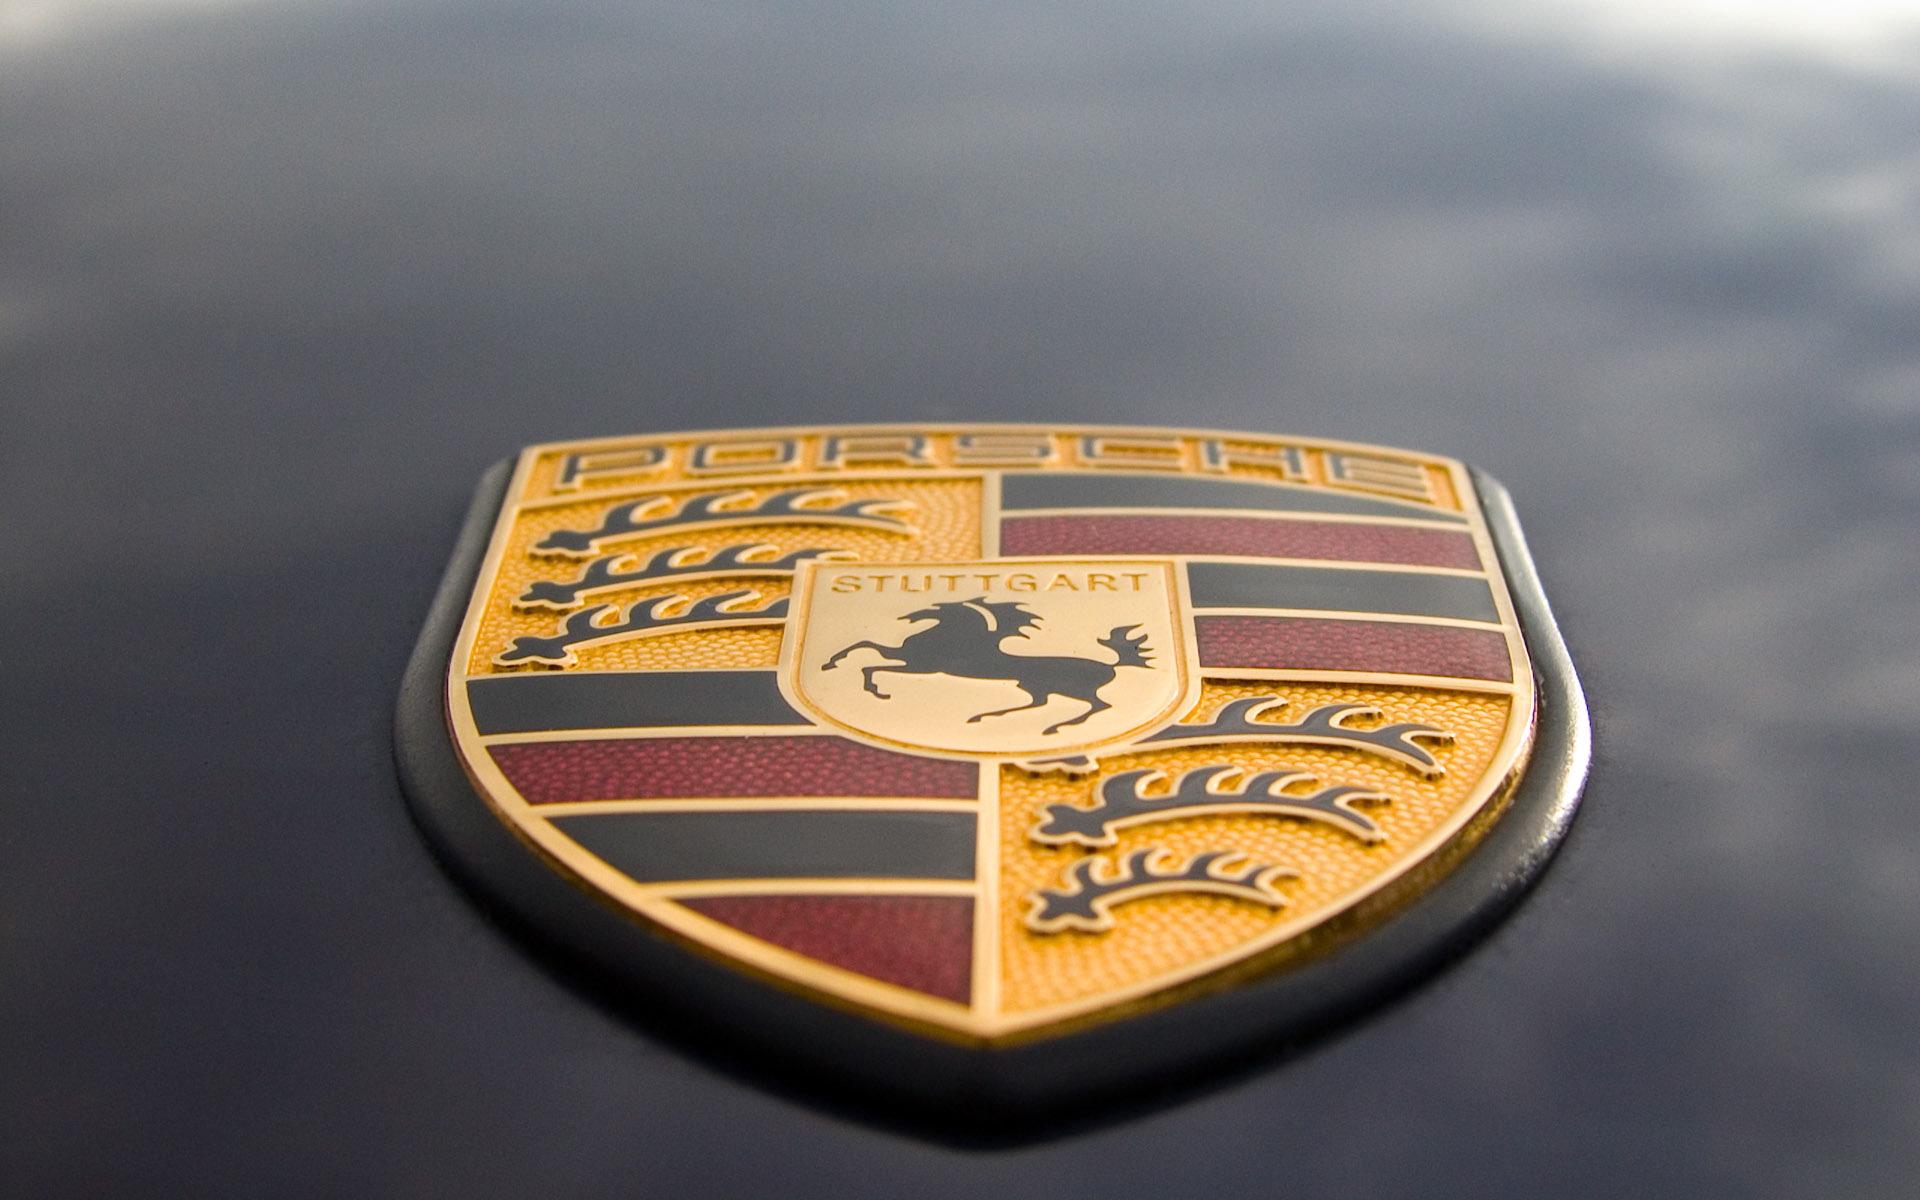 Porsche Logo Wallpapers Pictures Images 1920x1200